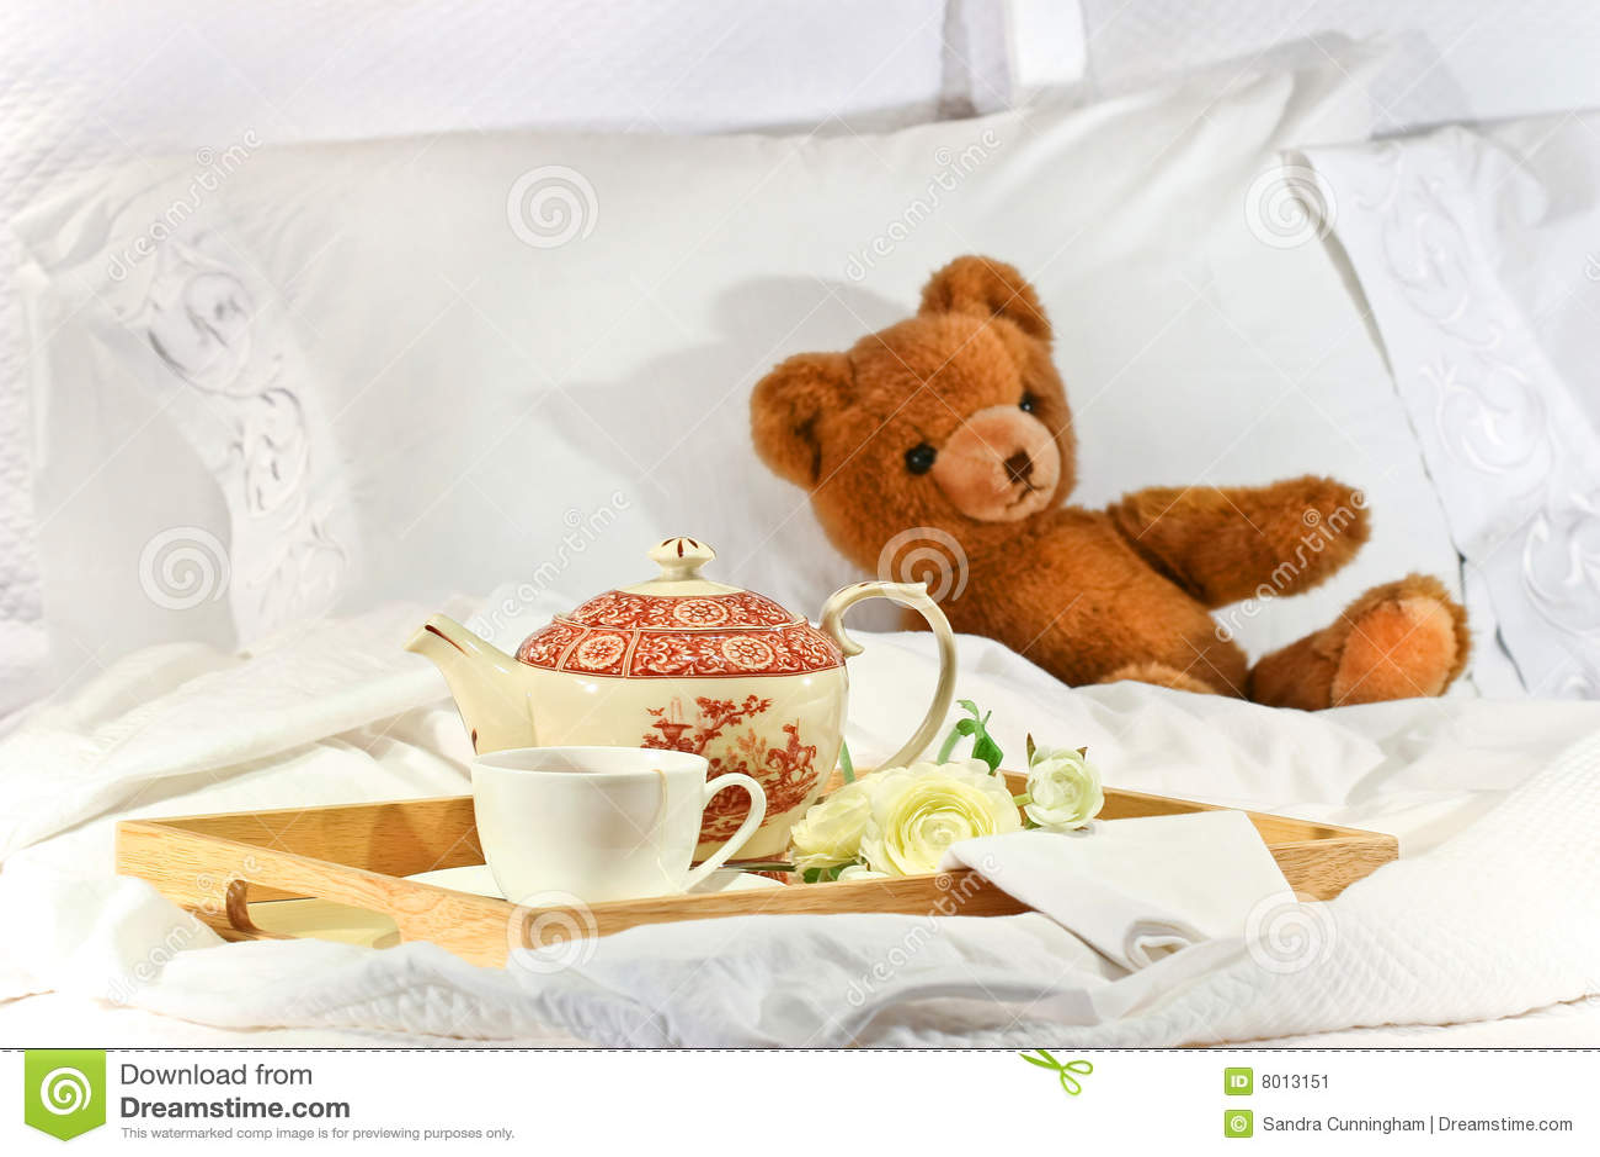 Chá na cama com peluche